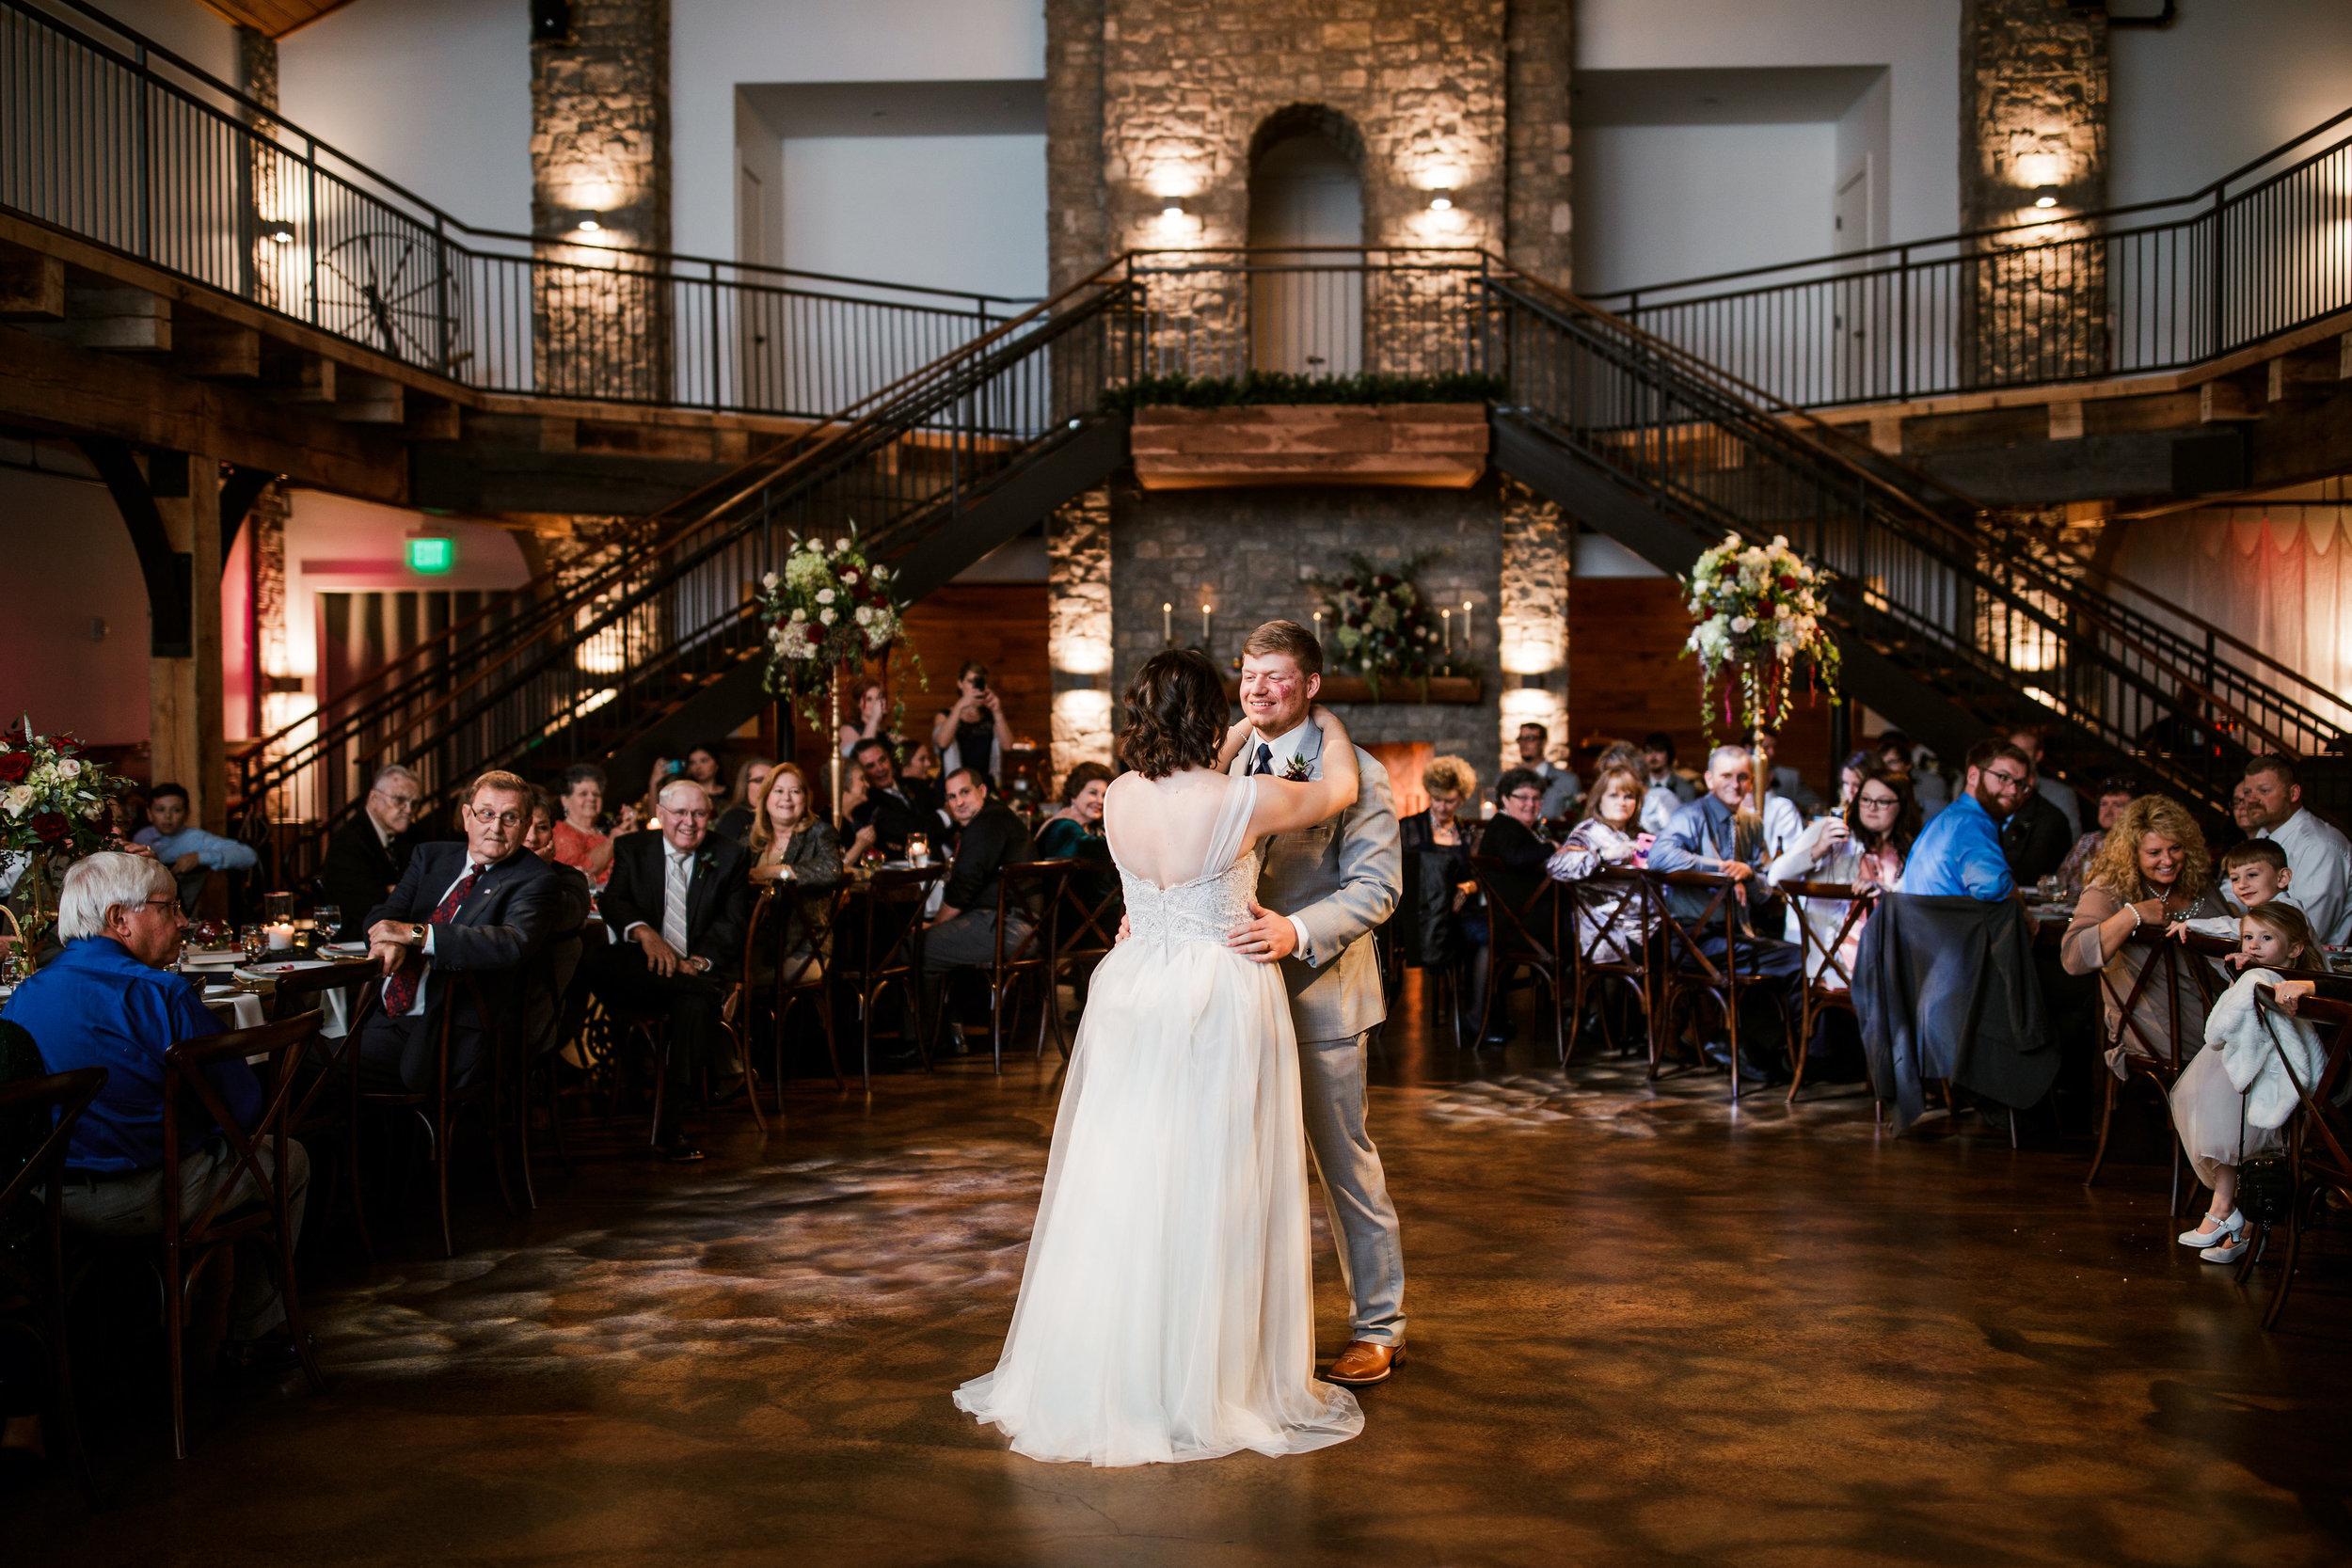 Graystone-Quarry-Wedding 72.jpg